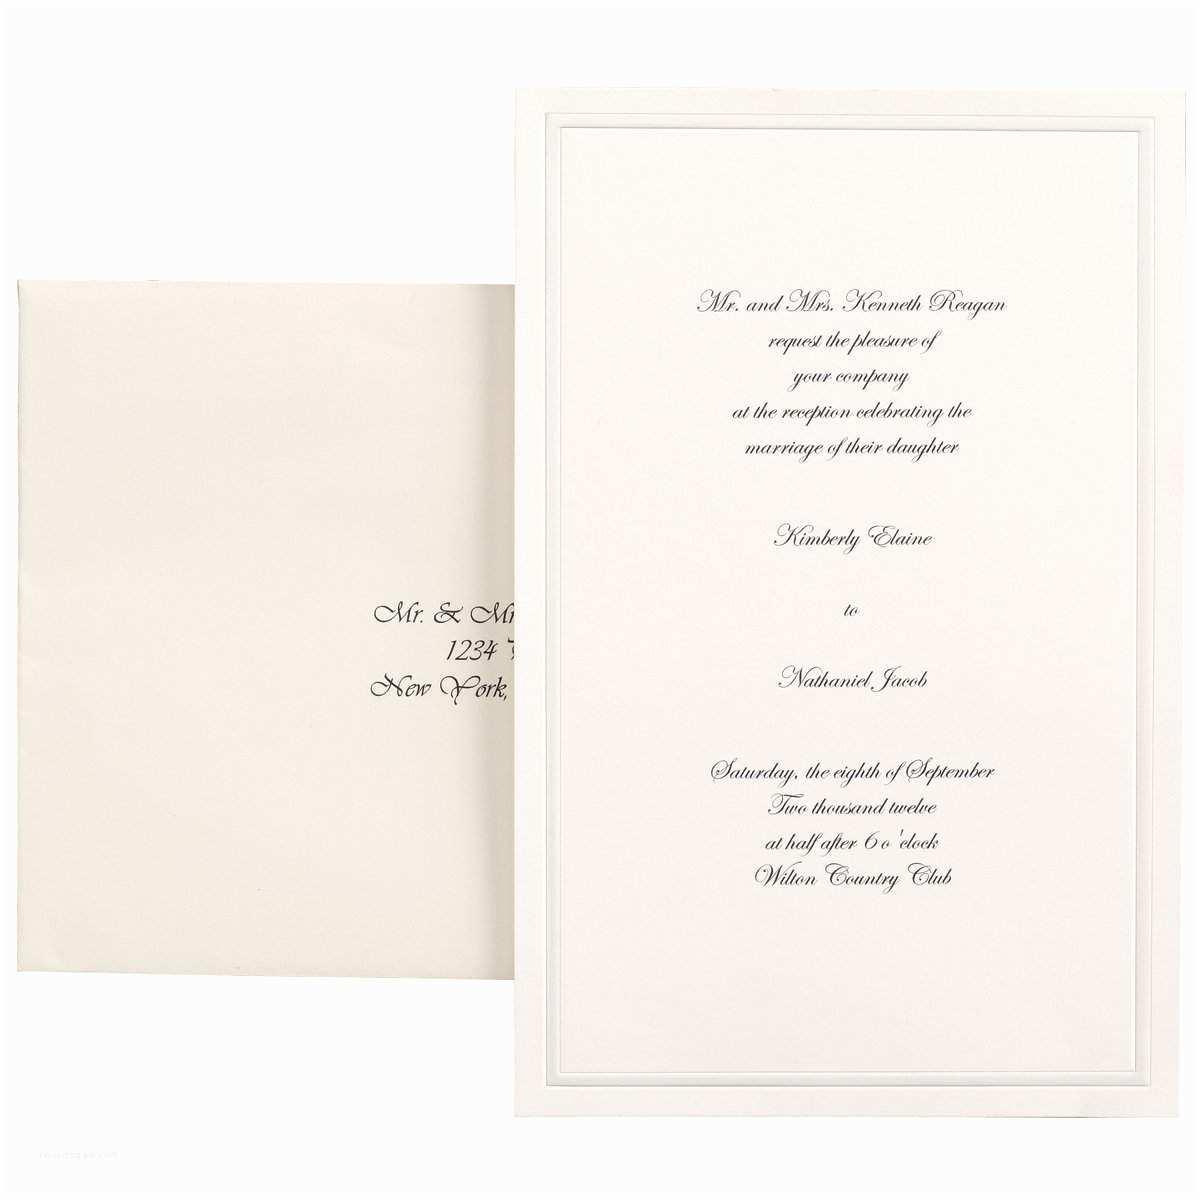 Print Your Own Wedding Invitations Kits top 10 Best Cheap Diy Wedding Invitations